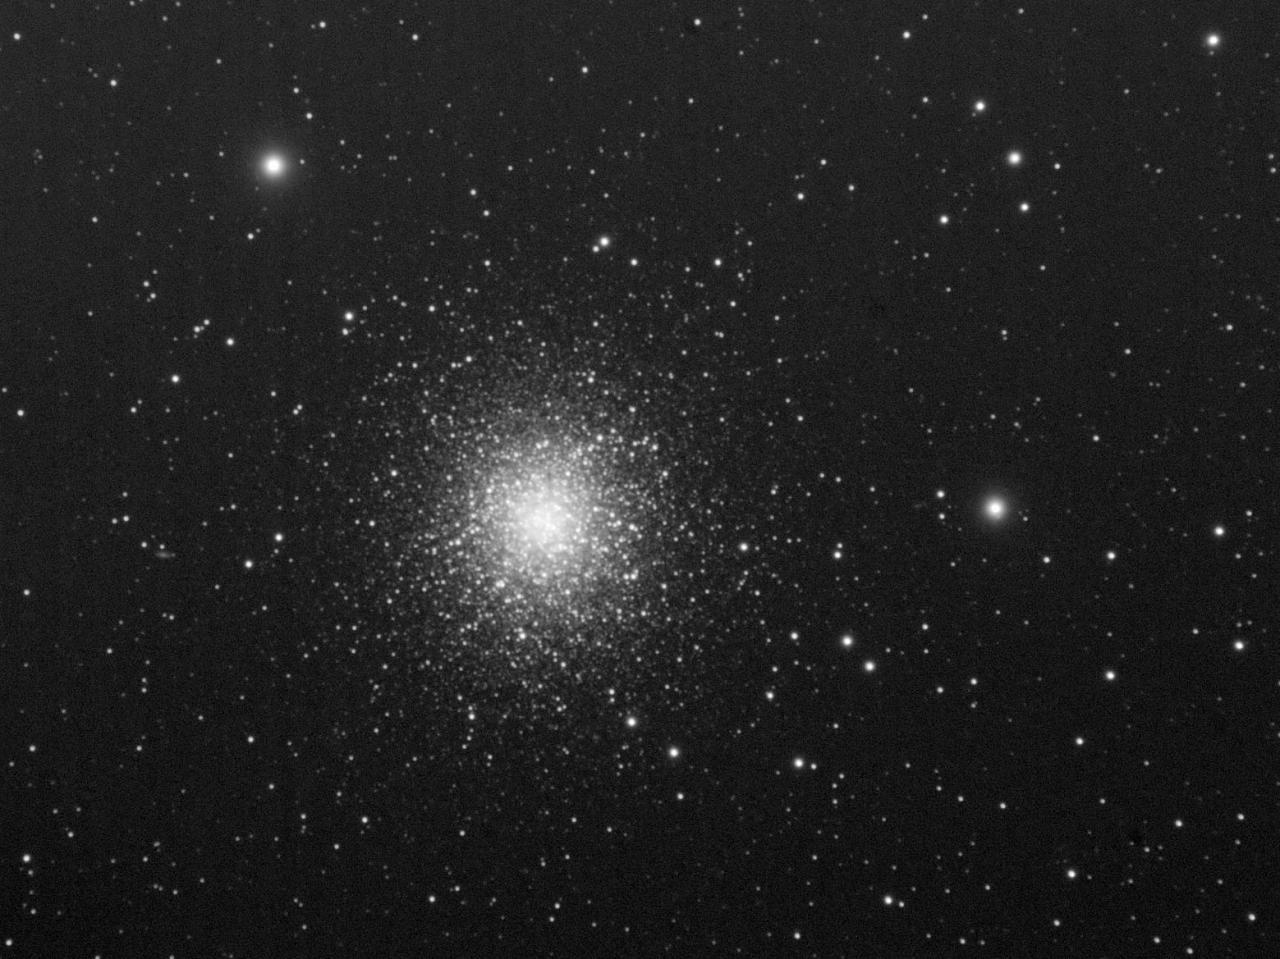 M13 amas globulaire